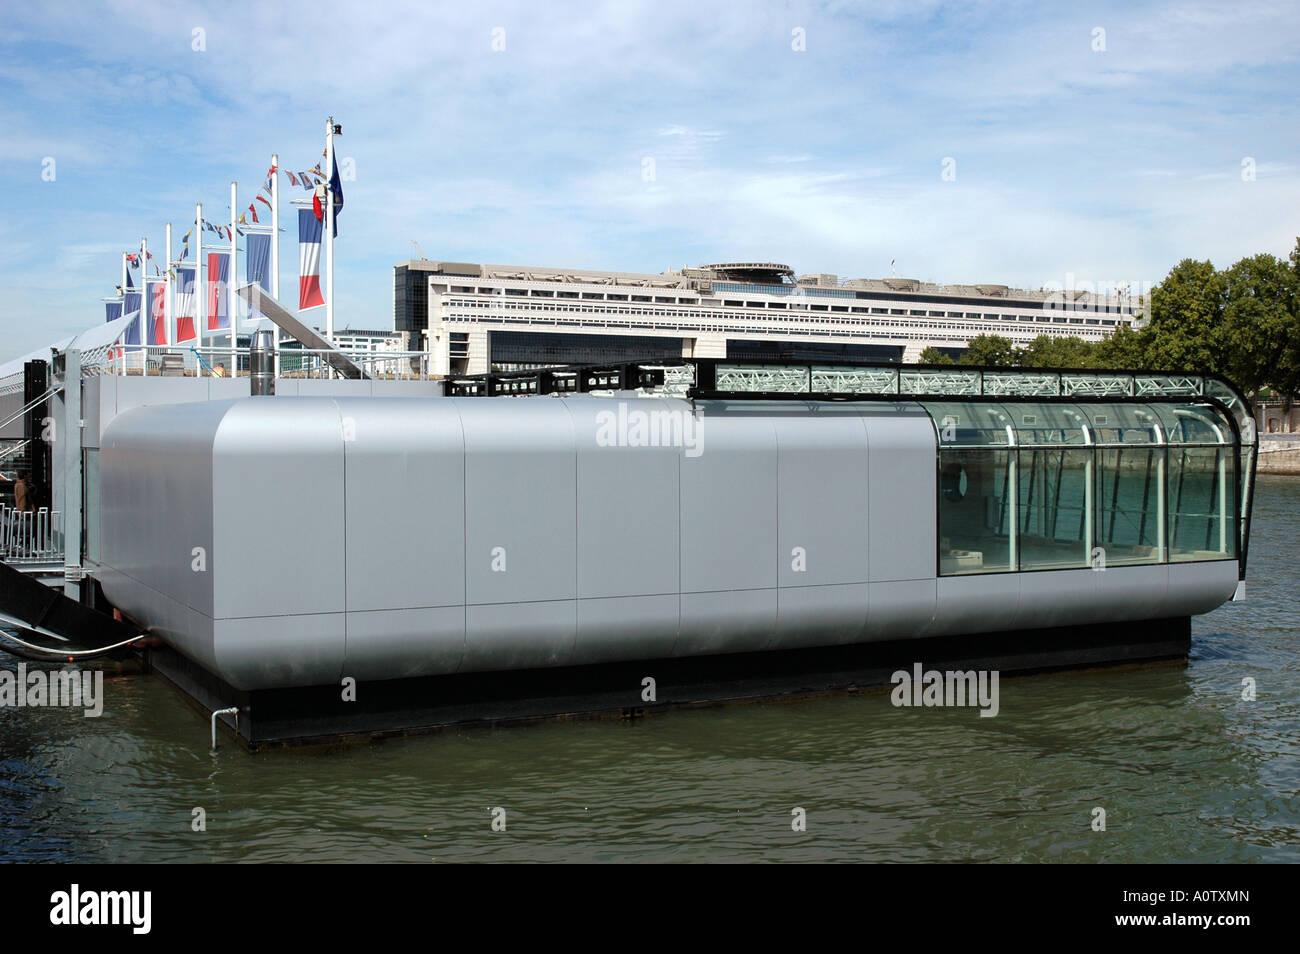 Seine River Paris France Piscine Flottante Josephine Baker Port De